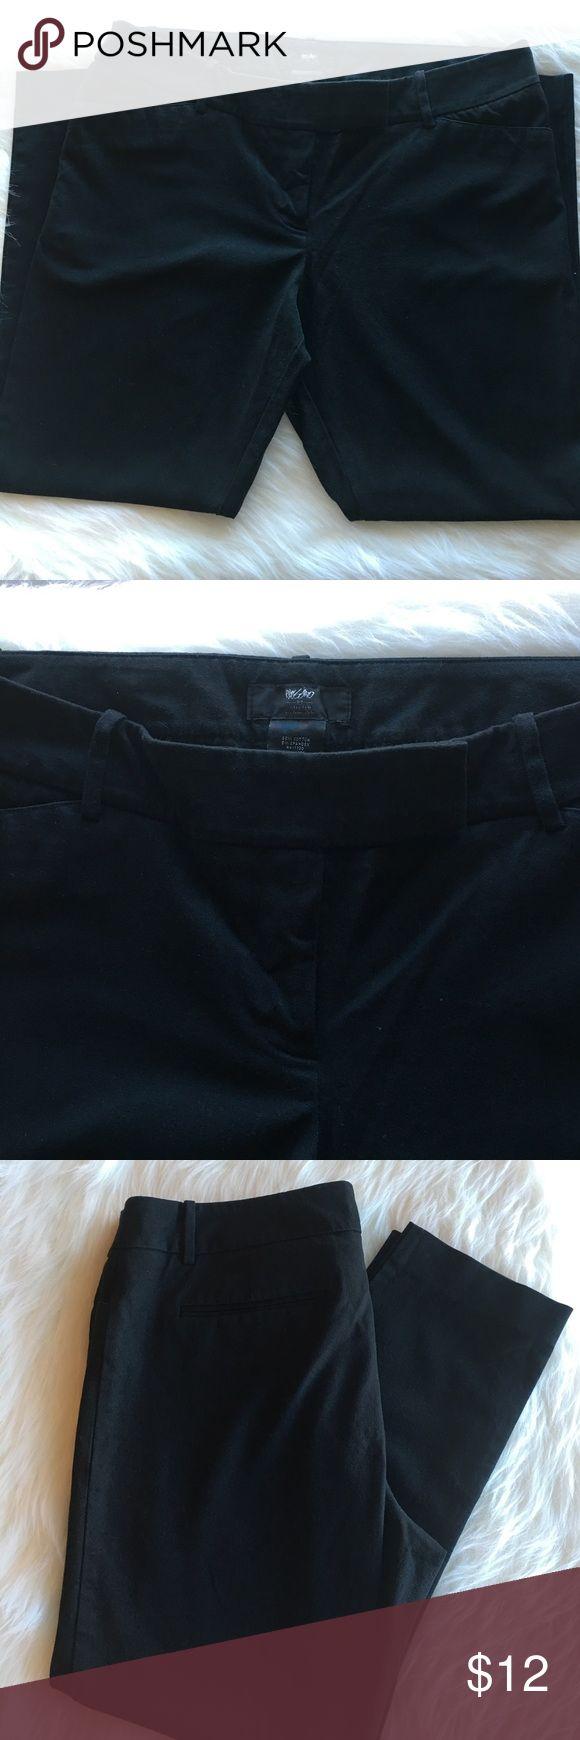 Mossimo black ankle pant Mossimo black dress ankle pant size 16 Mossimo Supply Co Pants Ankle & Cropped